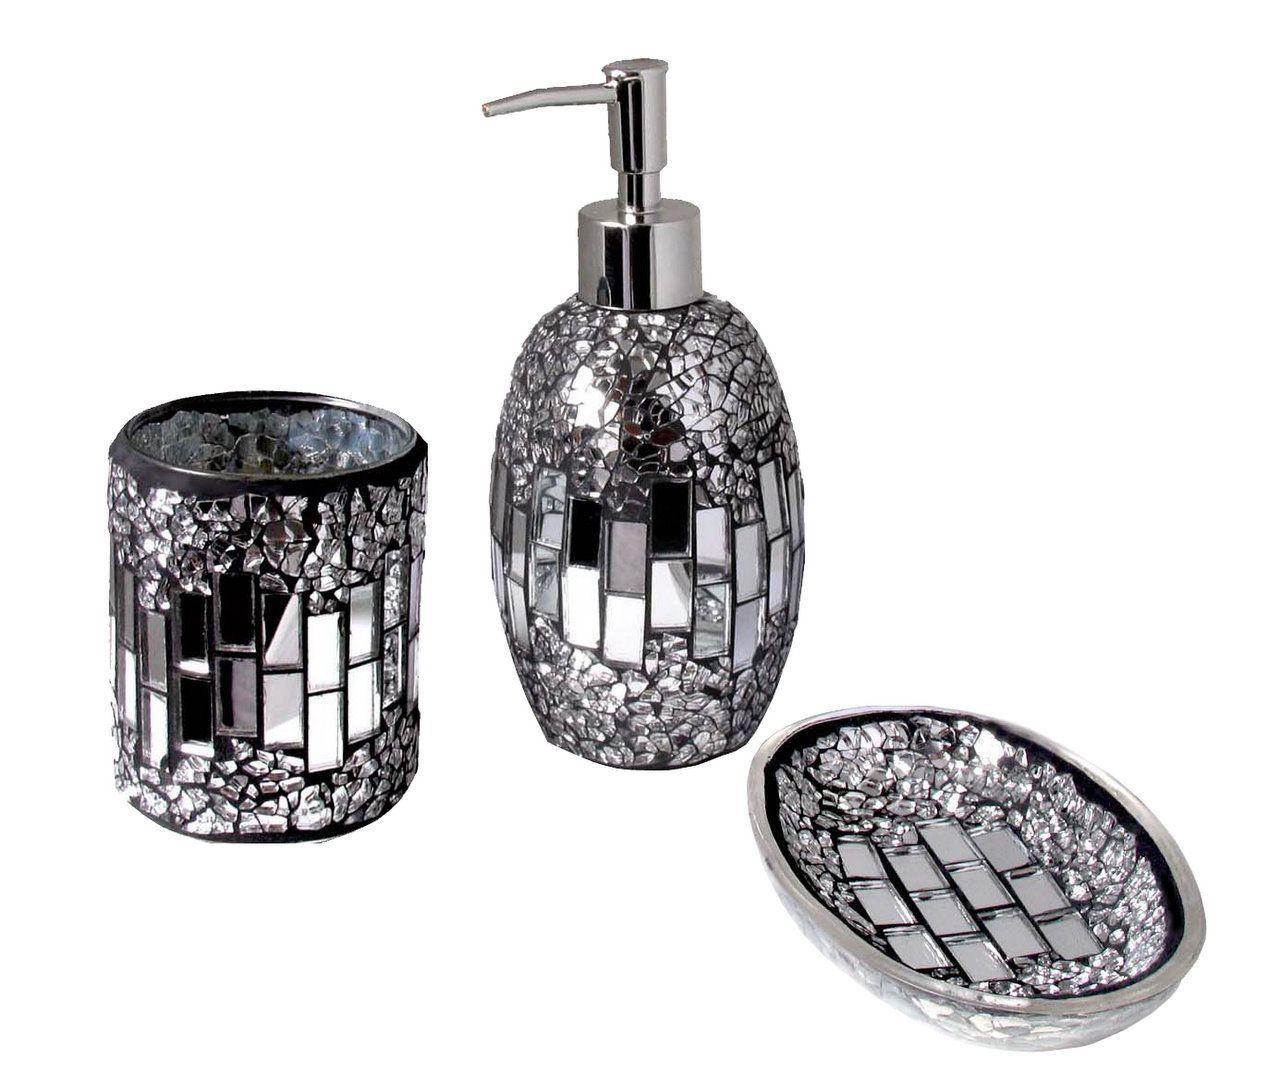 20 Silver Bathroom Accessories Magzhouse, Silver Bathroom Accessories Set